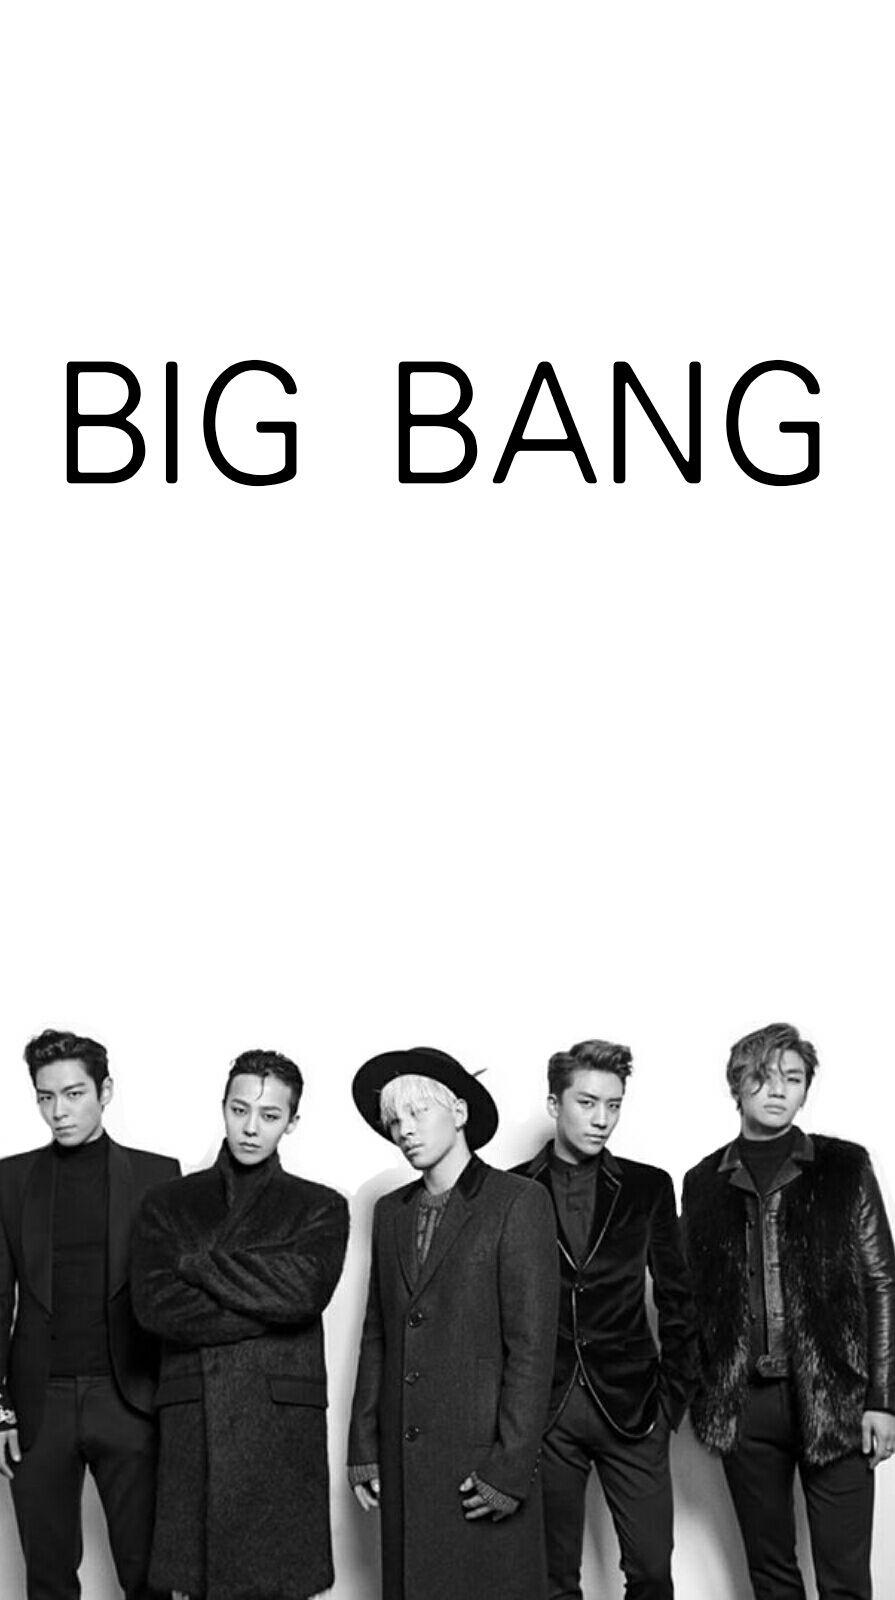 Bigbang Bigbangwallpaper Wallpaper Phonewallpaper Kpop